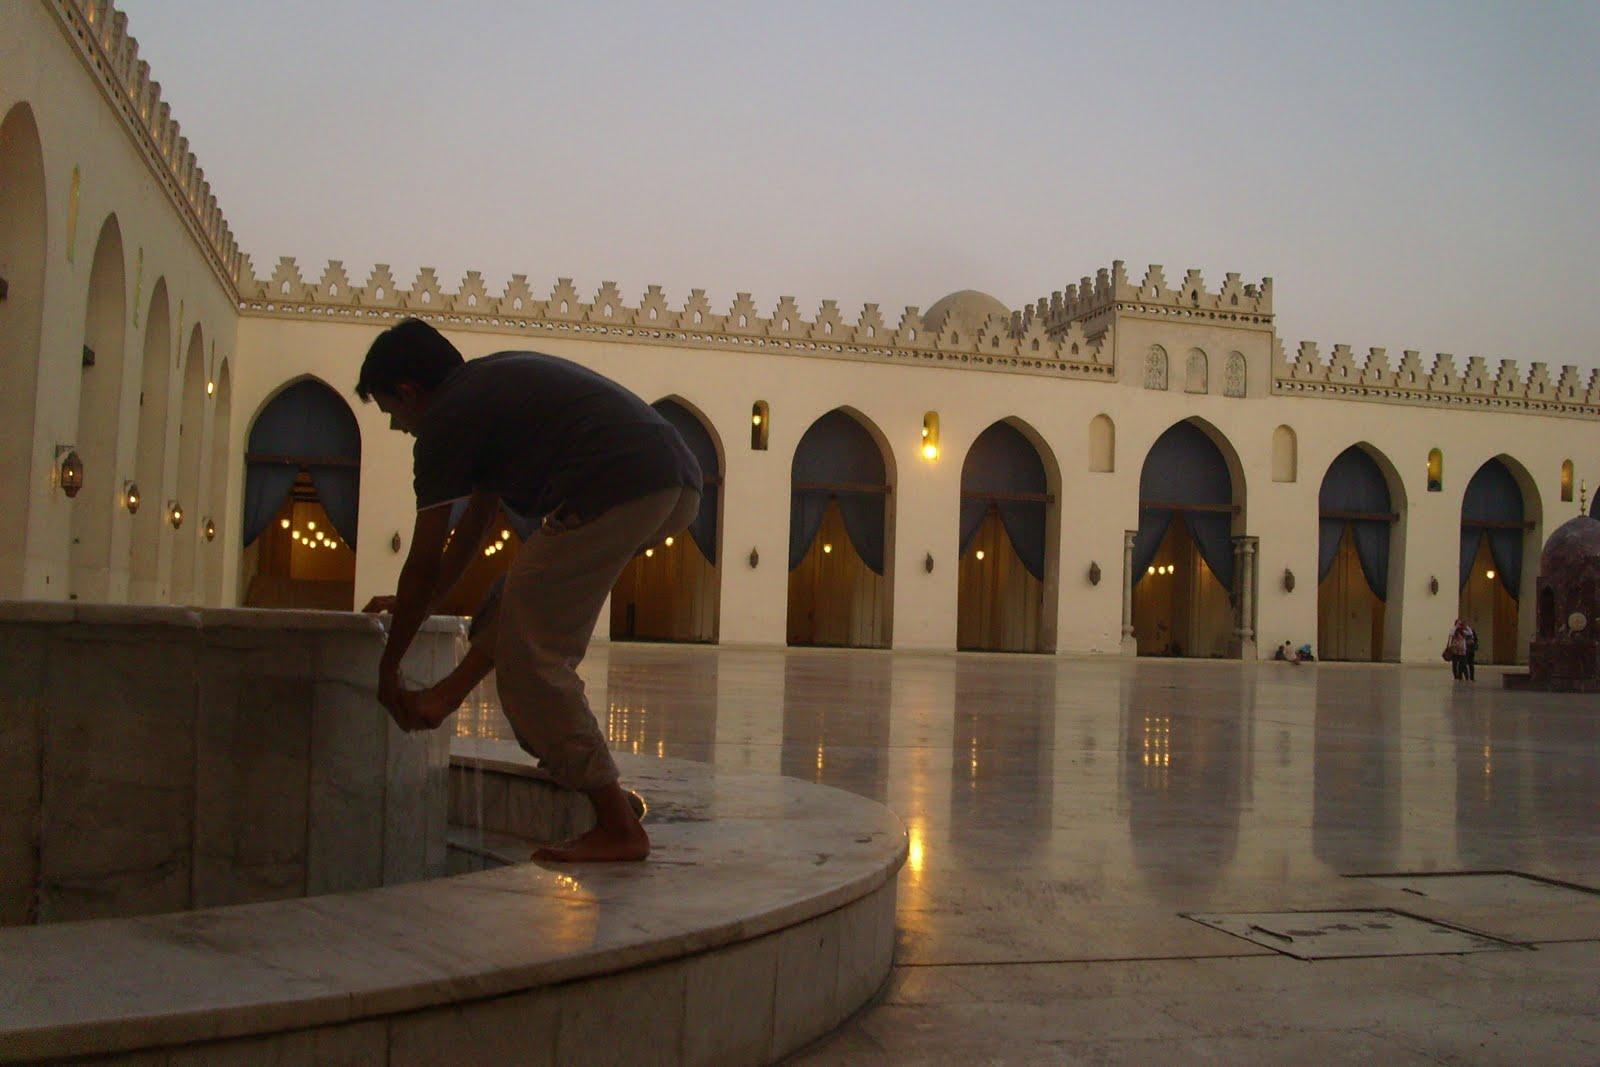 May 2014 Techno Magazine Download Circuit Wizard Full Version Free Isnan Nabawi Malam Pertama Ramadan Kami Di Sharia Muizz Kaherah Fatimiyyah Pengalaman Kali Benar Solat Dua Jemaah Dalam Satu Masjid